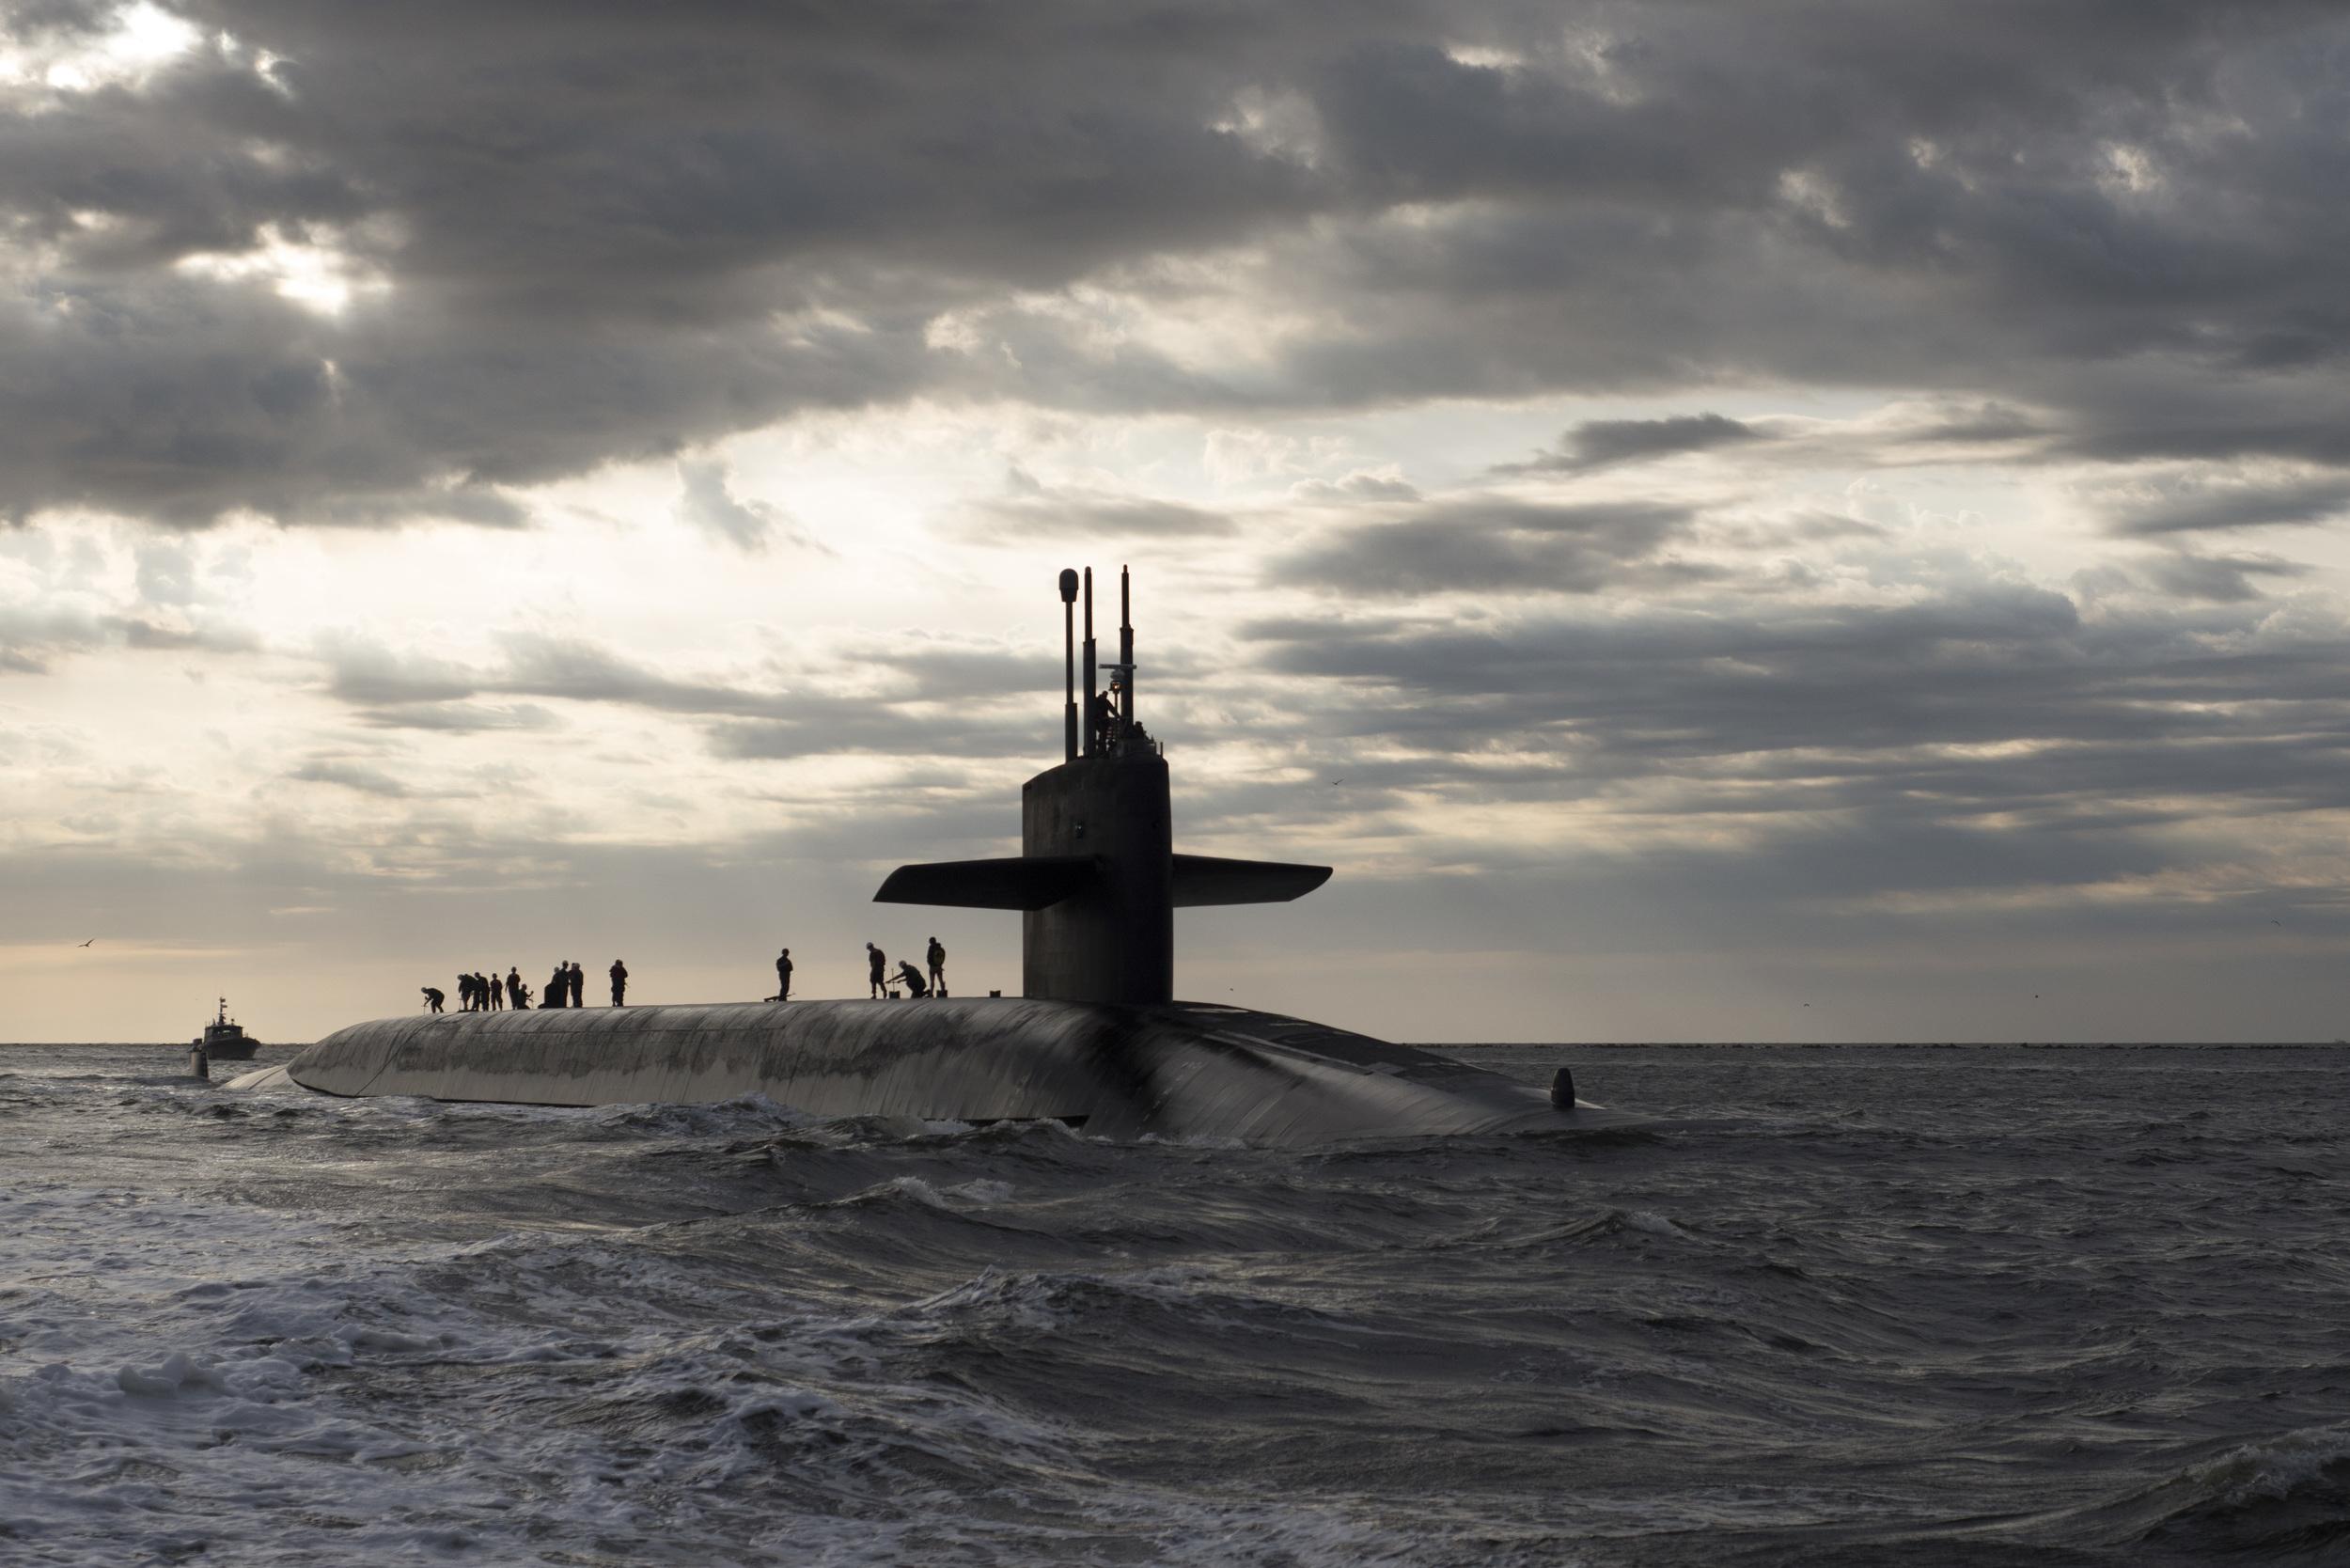 Ohio-class ballistic missile submarine USS Rhode Island - Photo courtesy U.S. Navy